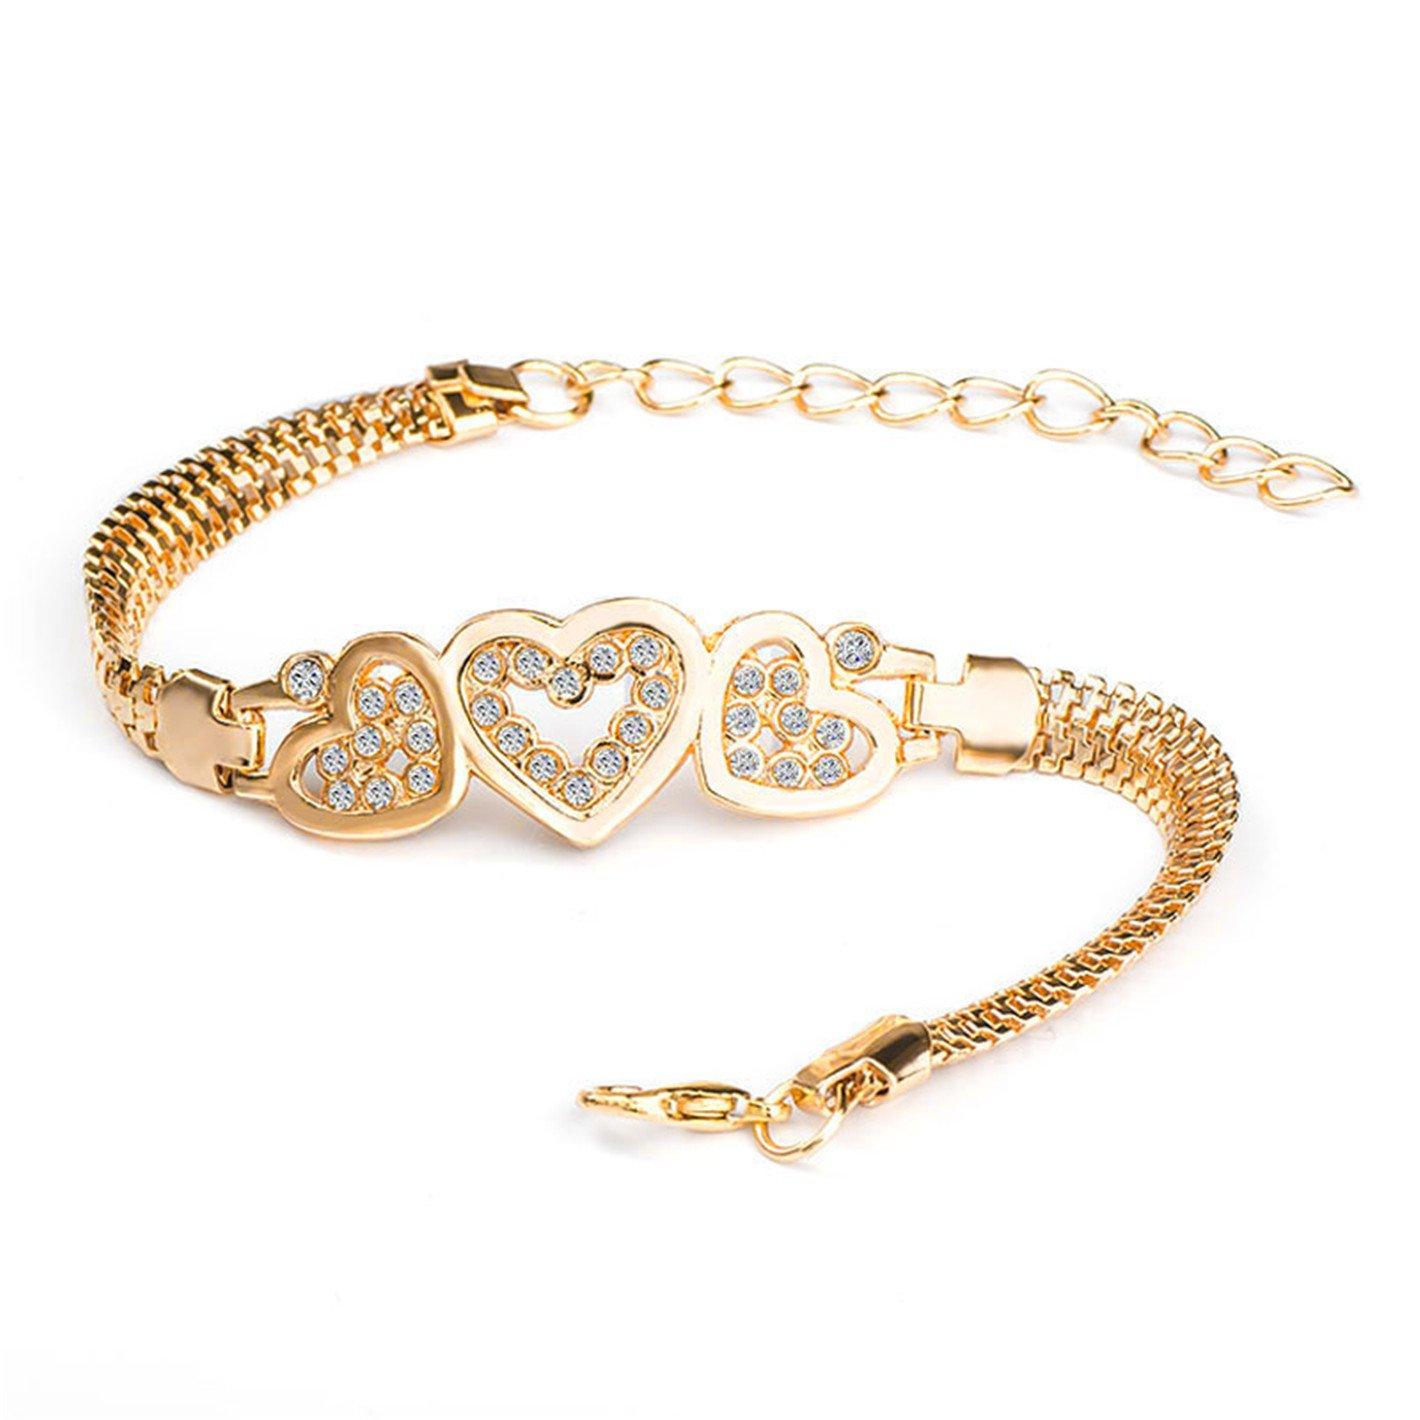 Olive Tayl Female Jewellry Accessories Multi-Designs Gold Color Alloy Crystal & Rhinestone Flash Cuff Chain wrap Bra